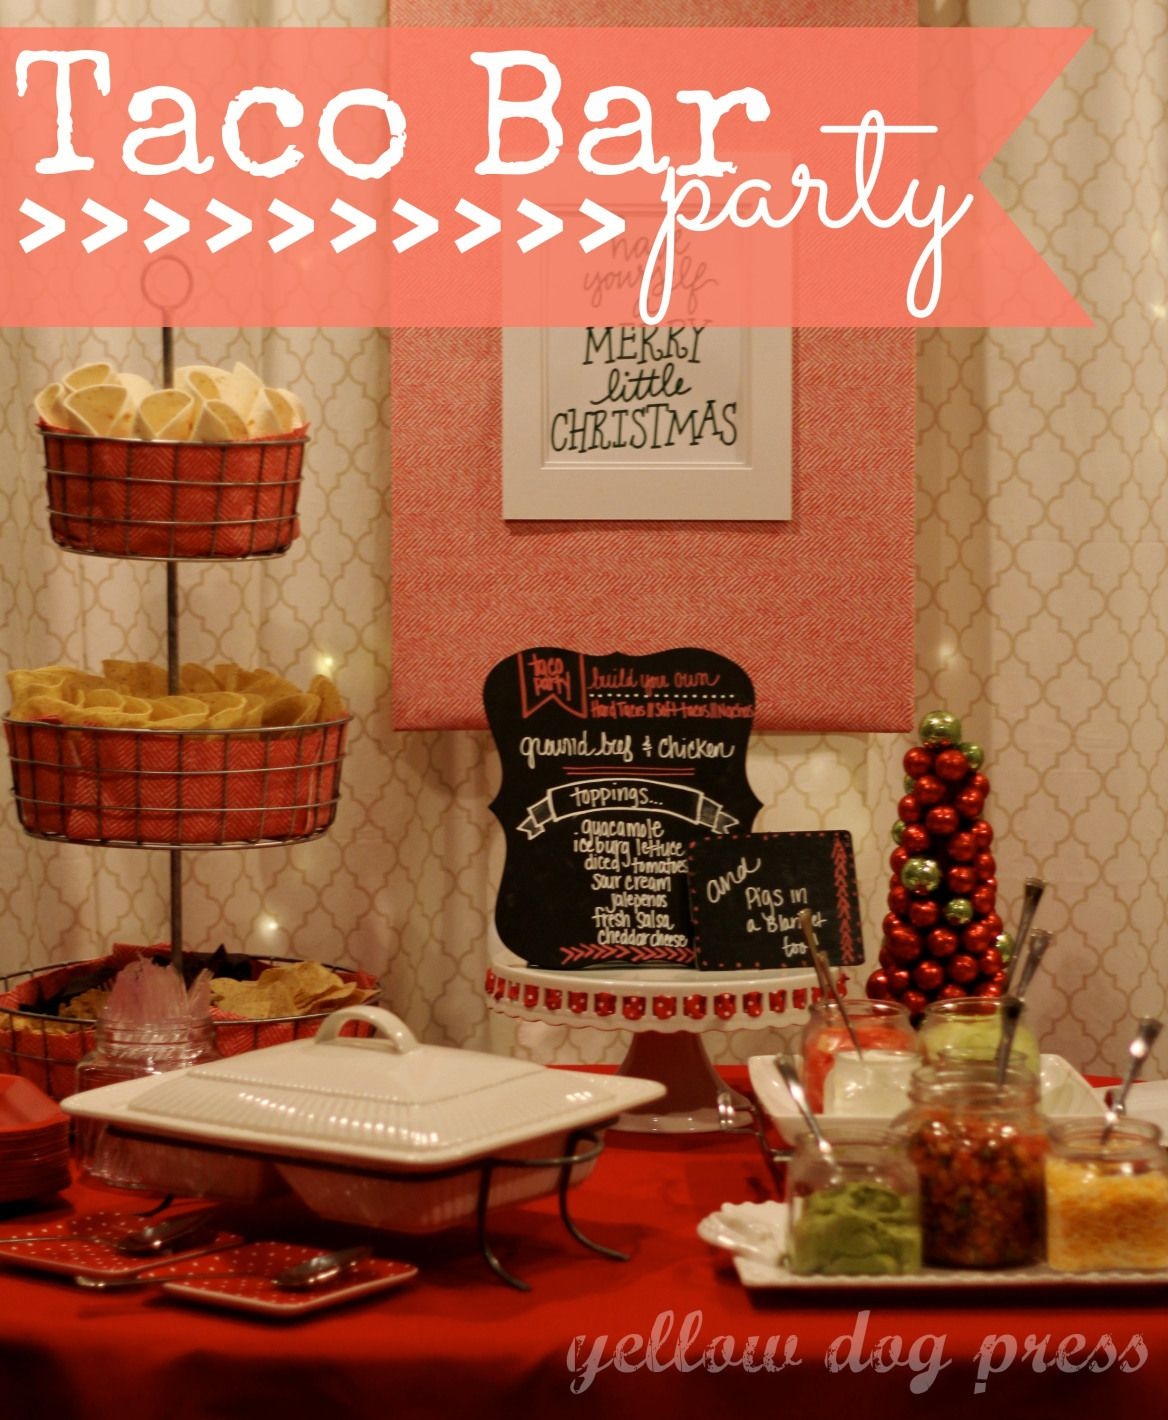 Taco Bar Party Kitchen Pinterest Taco bar party